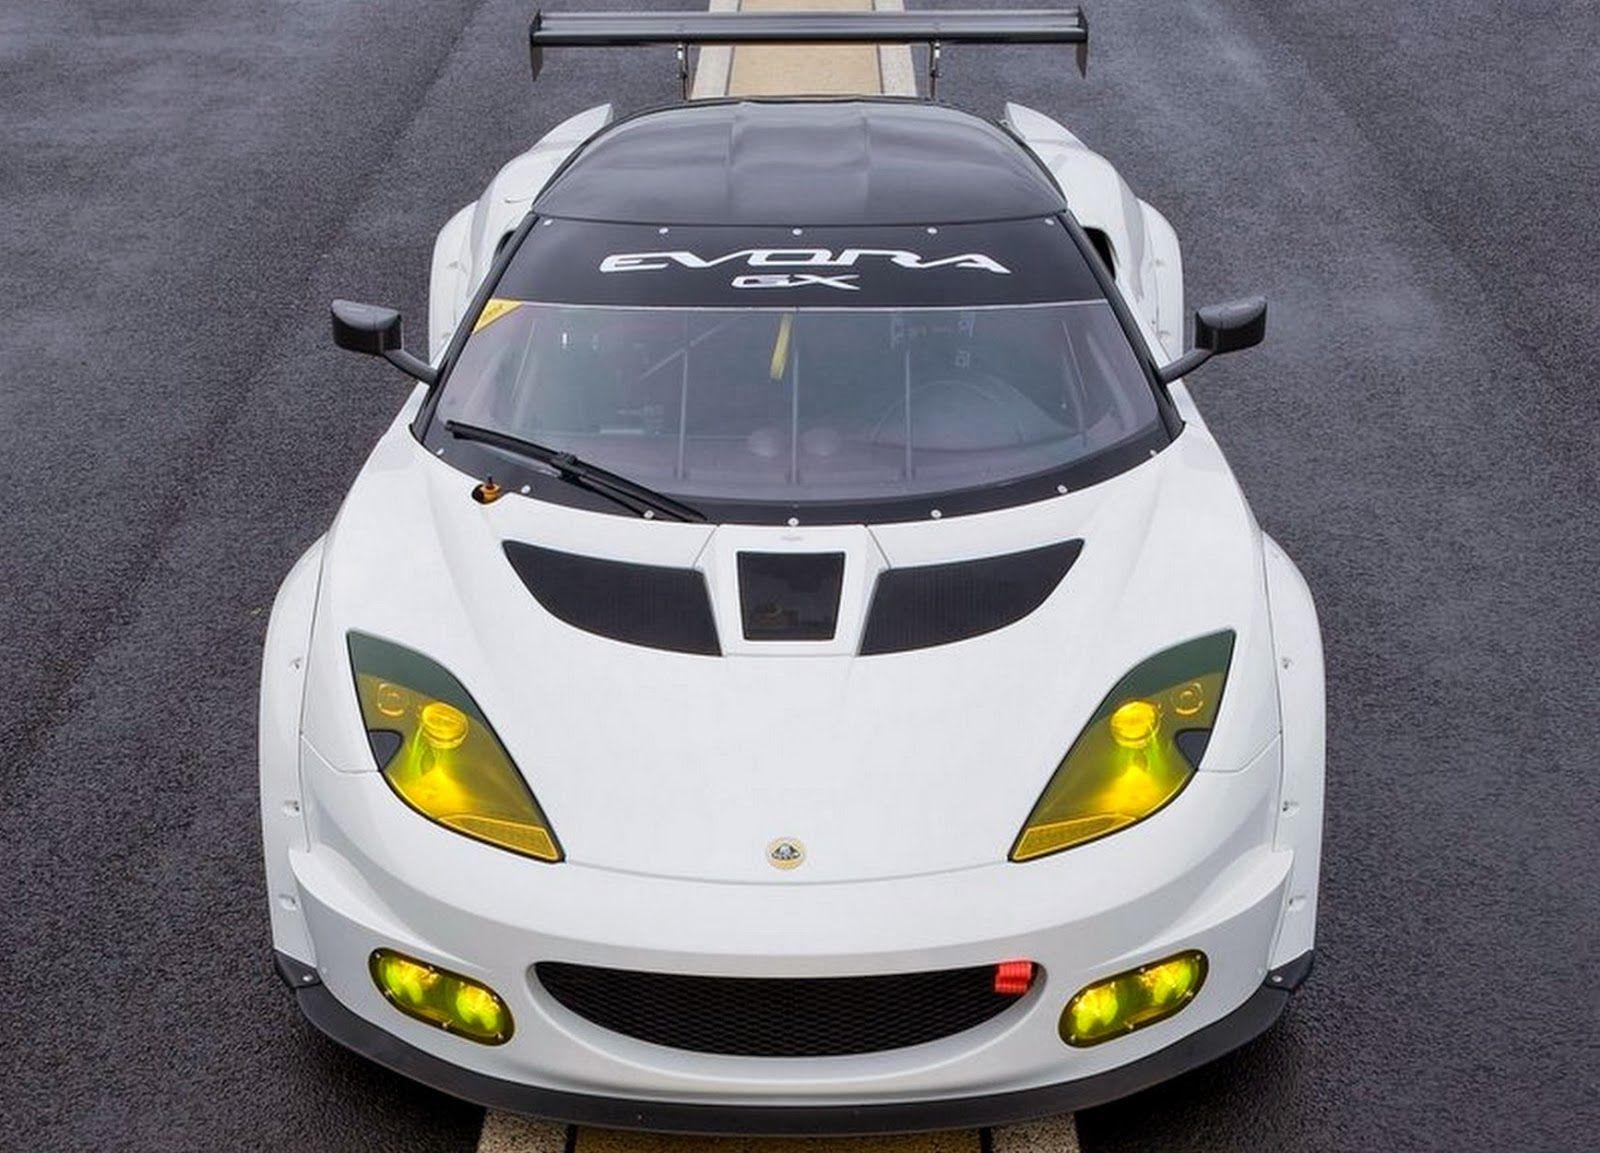 MULHERES X CARROS: Wallpaper - Lotus Evora GX Racecar 2013 | Carros ...